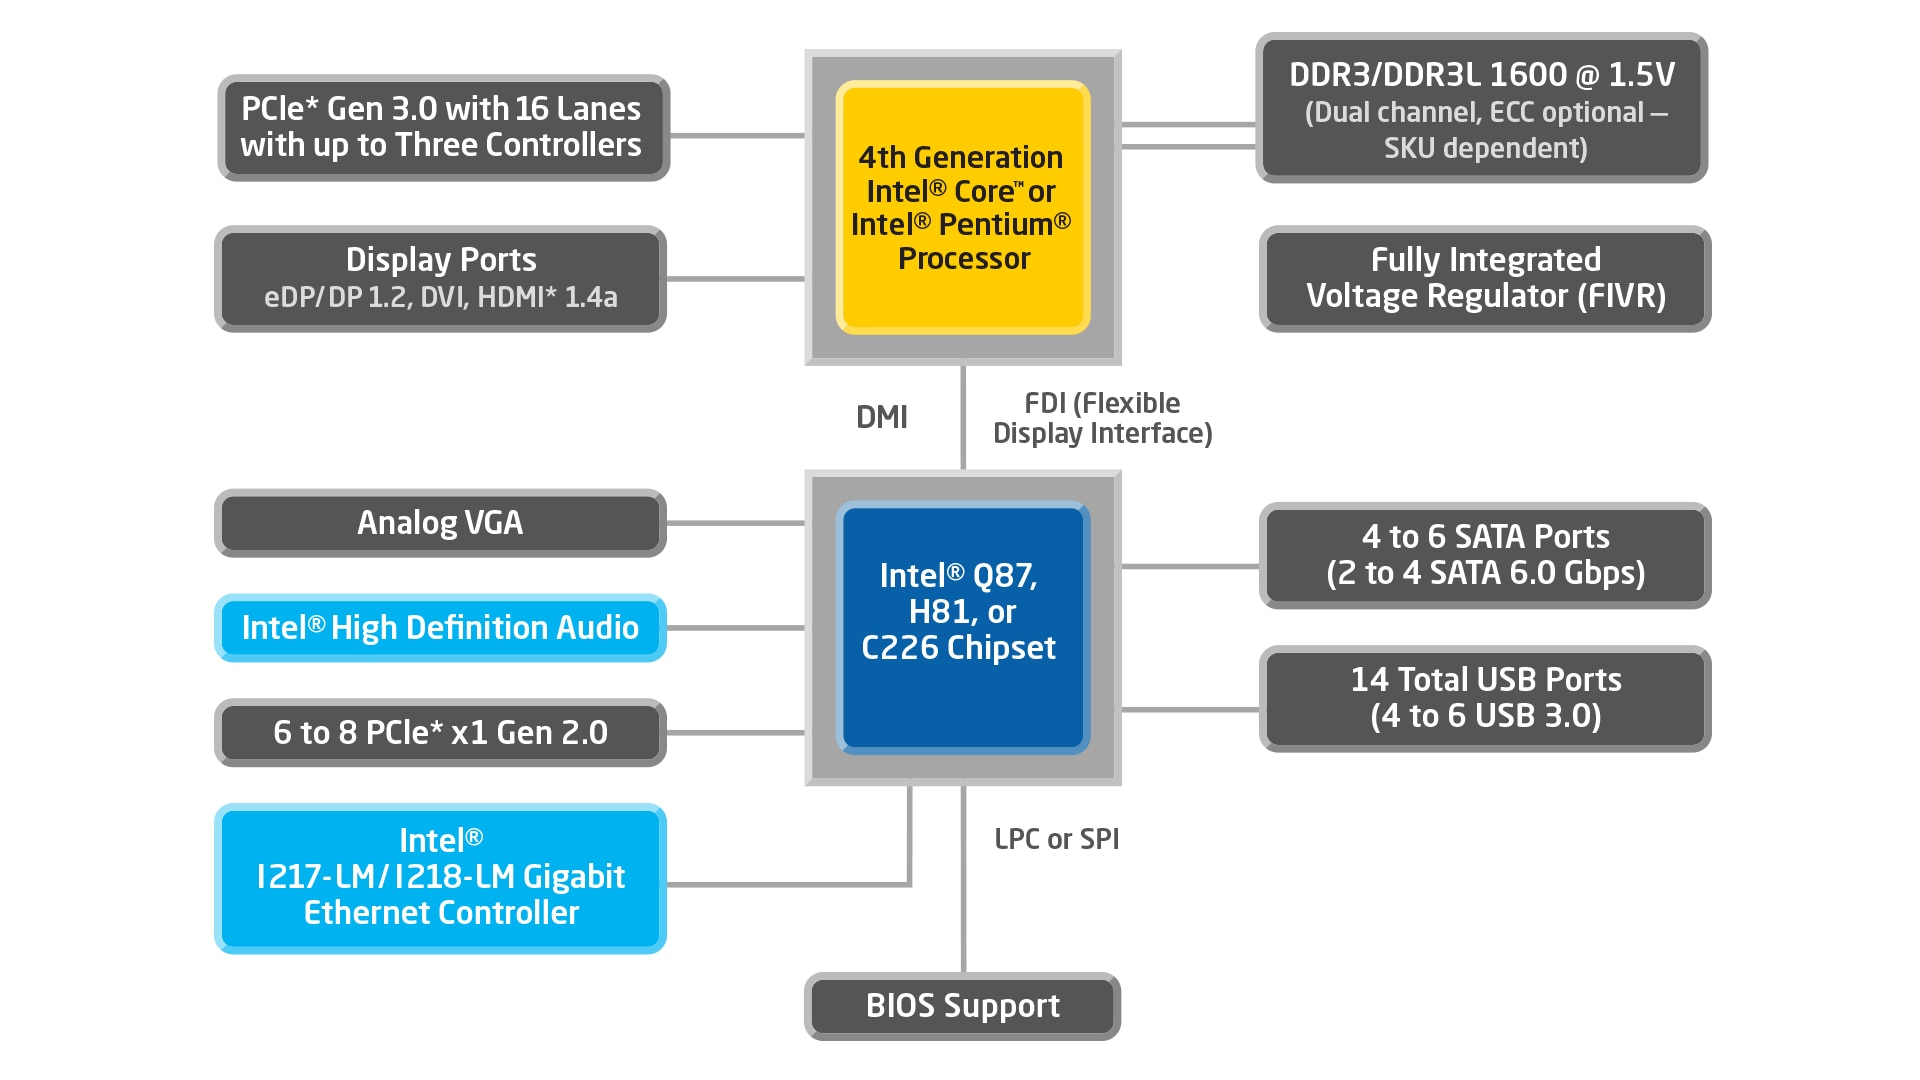 hight resolution of 4th generation intel core processors with intel q87 chipset block diagram pentium